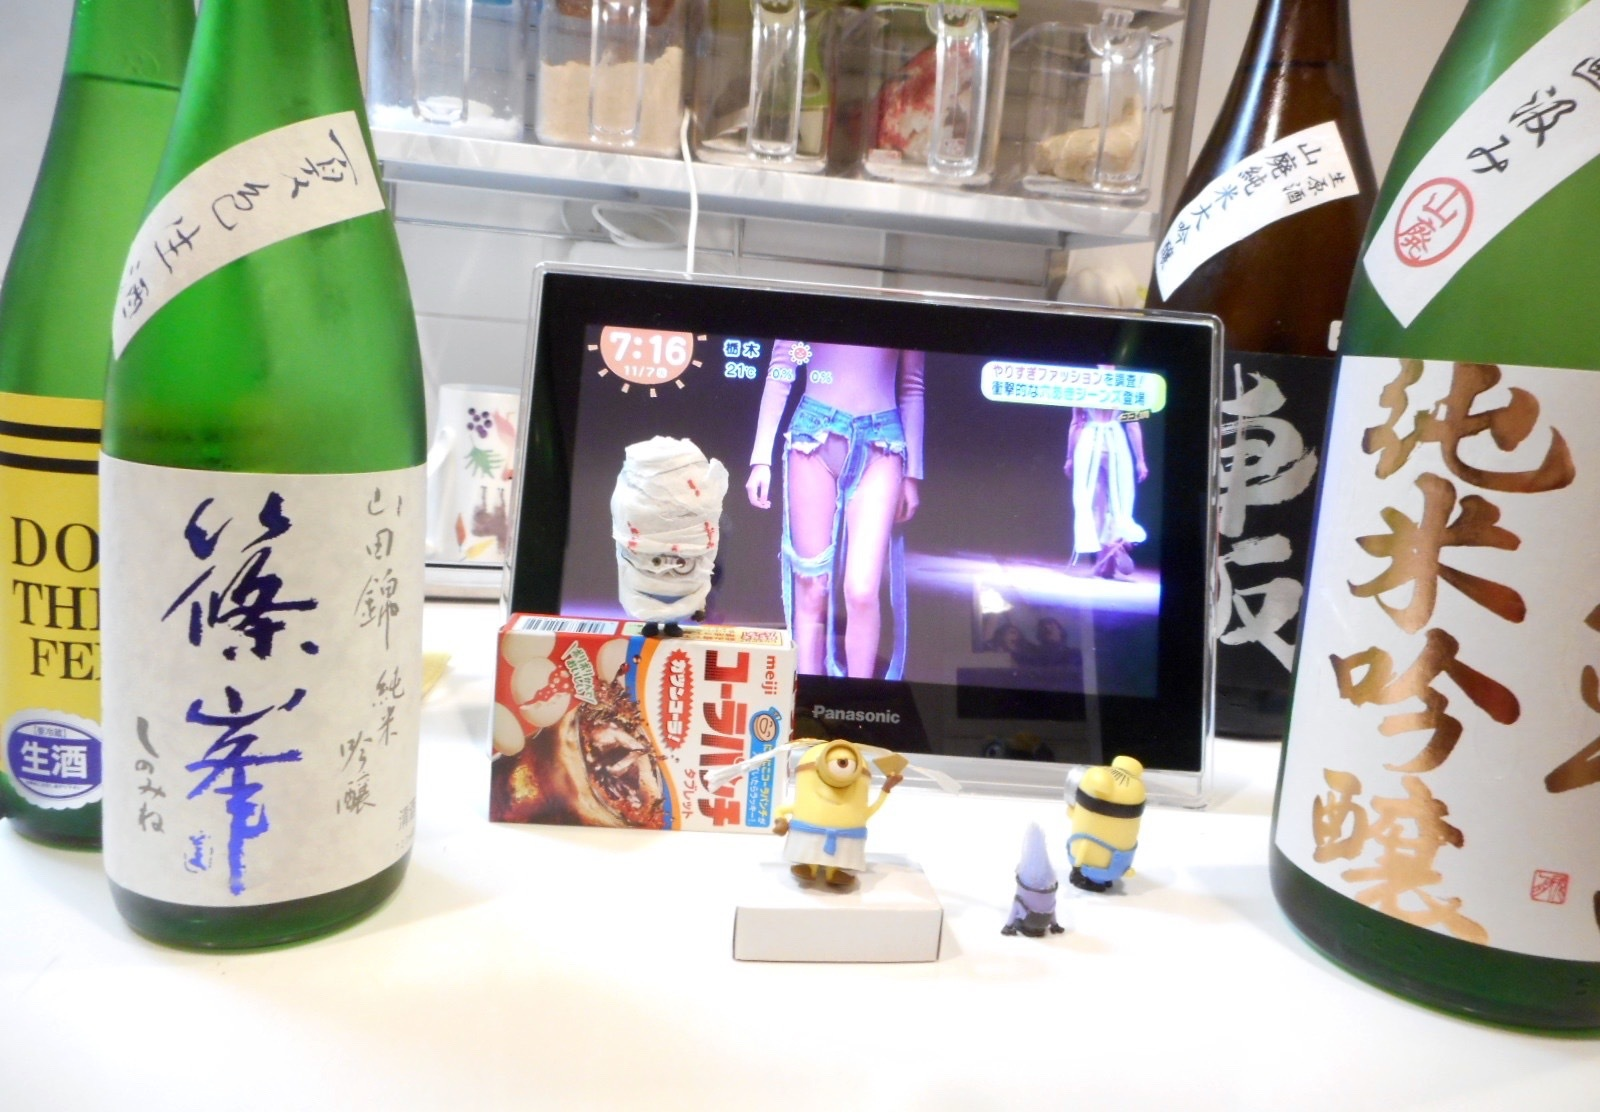 shinomine_sou_natsuiro28by10.jpg